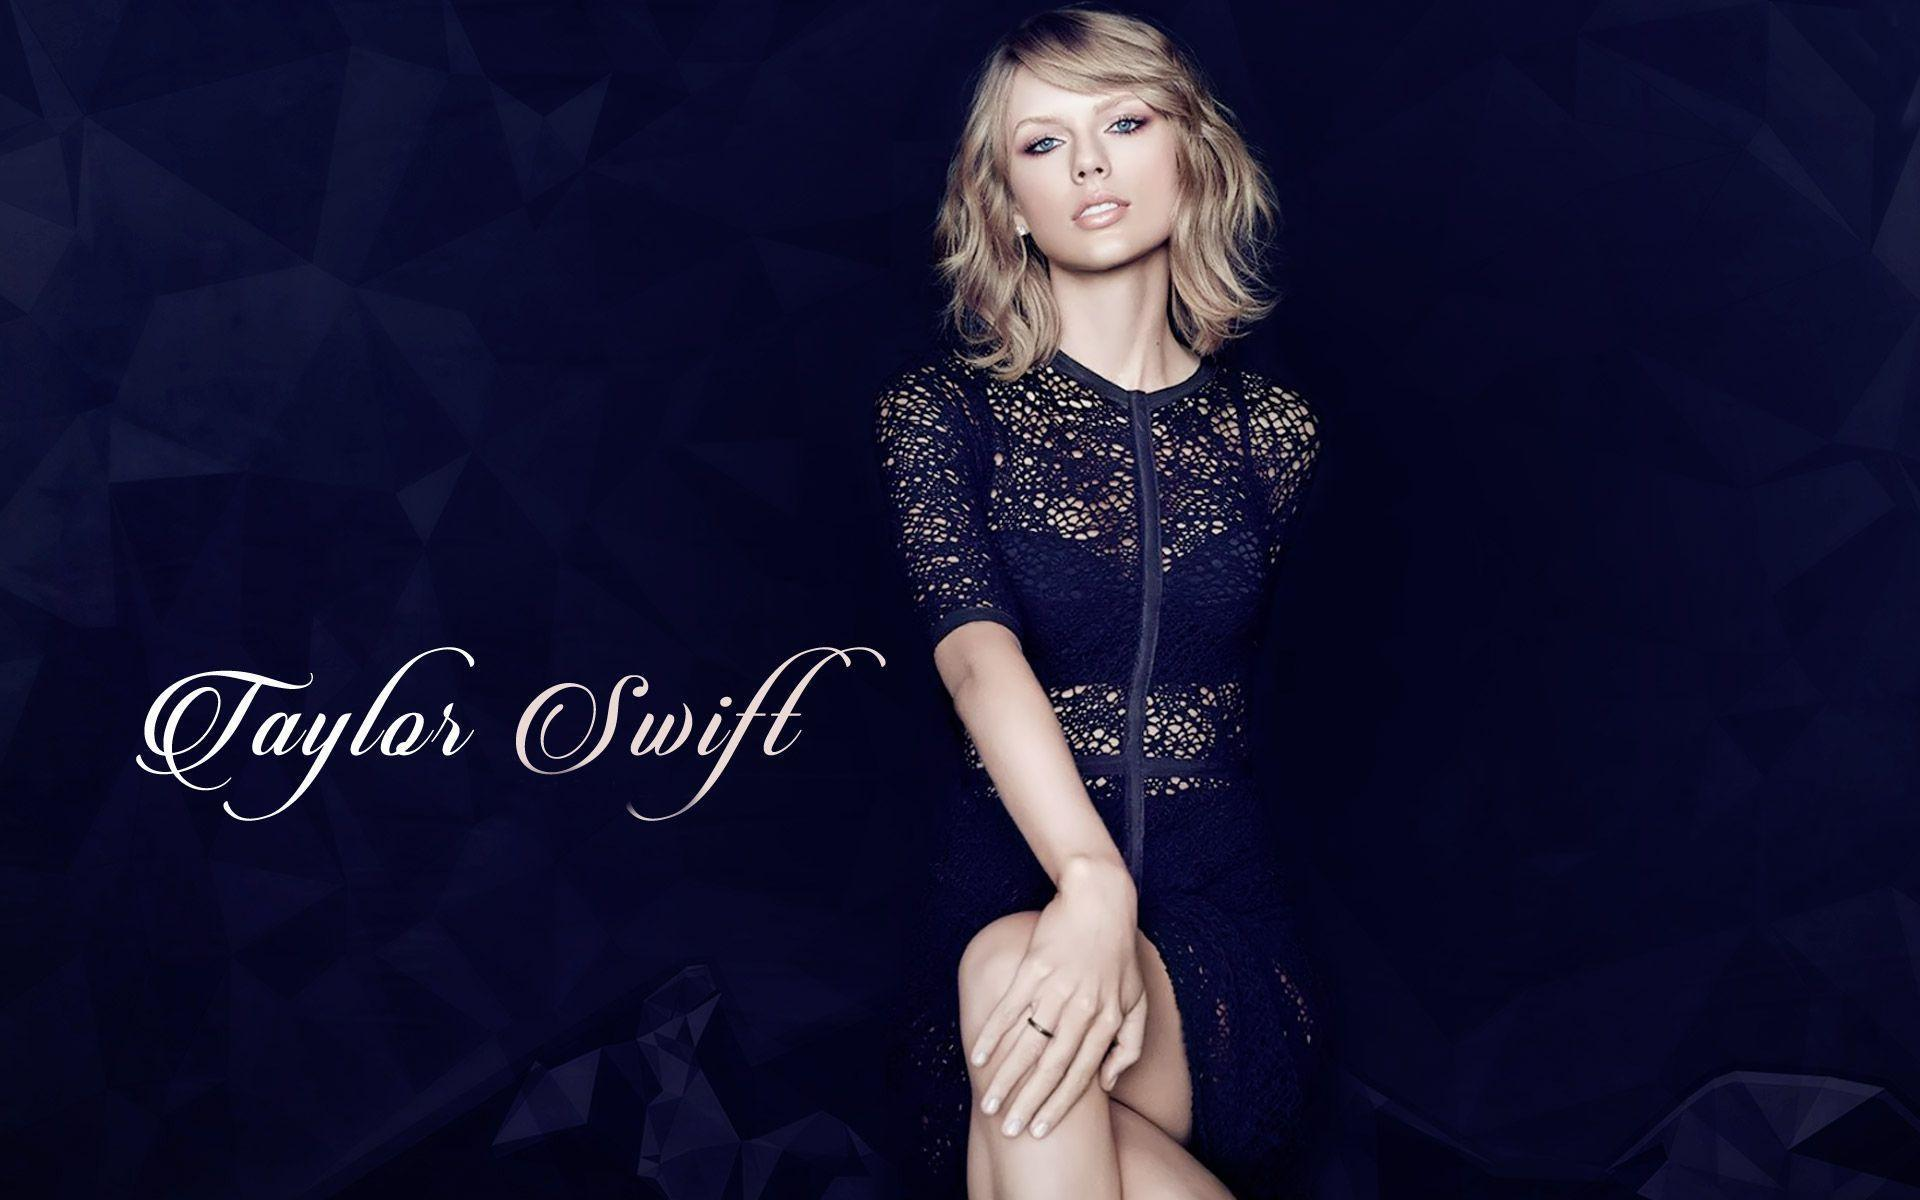 Taylor Swift Wallpapers Wallpaper